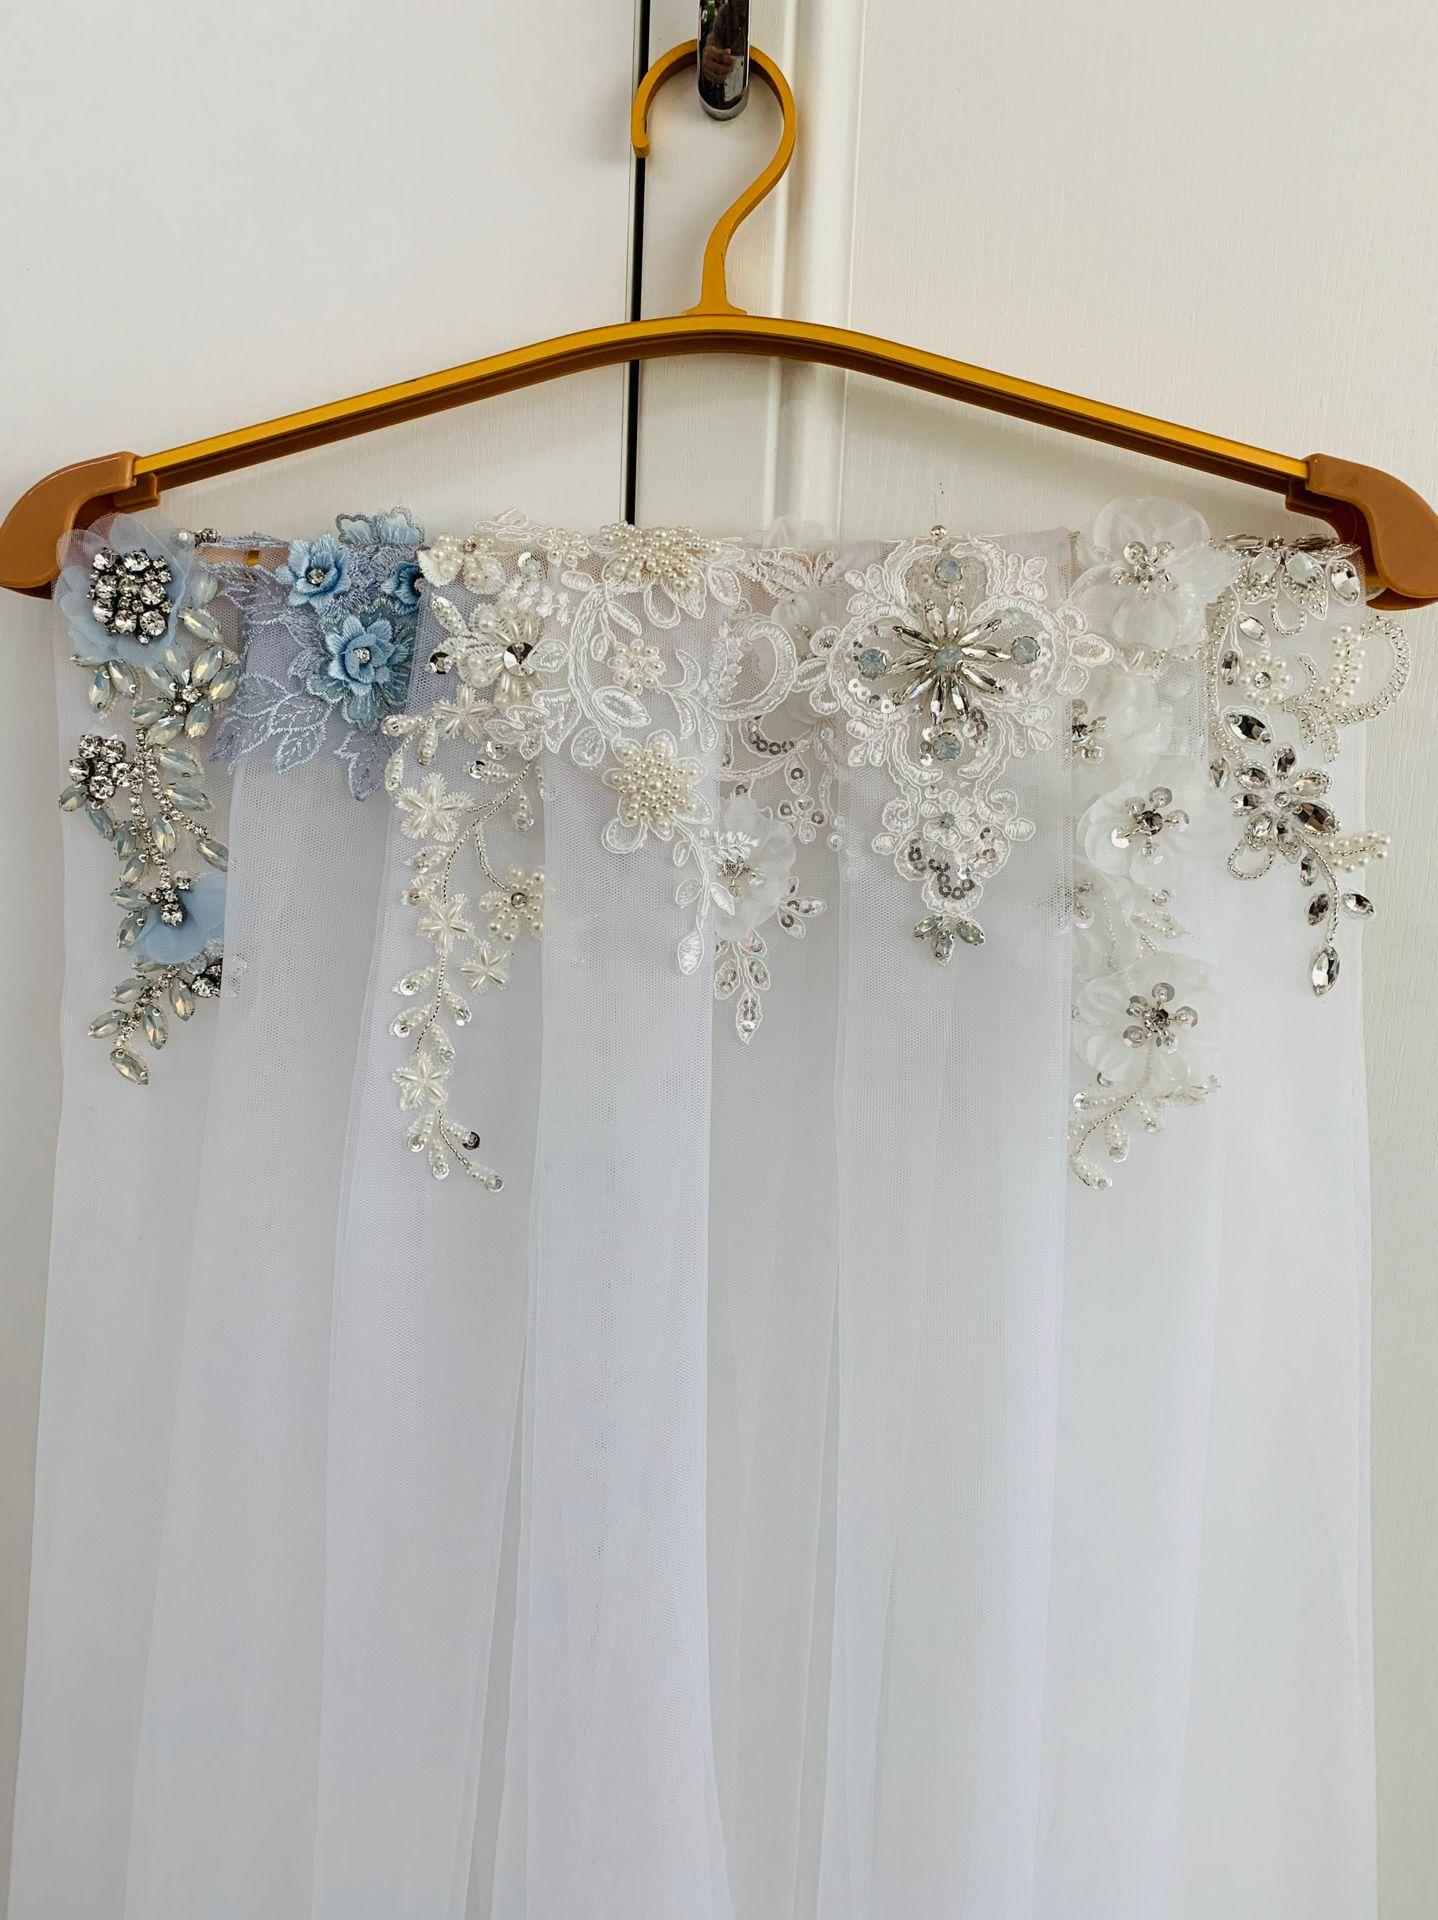 TOPQUEEN F01 Wedding Handmade Flowers Bridal Veils Wedding Headband Fashion Hairwear Special Veil For Wedding Hair Accessories